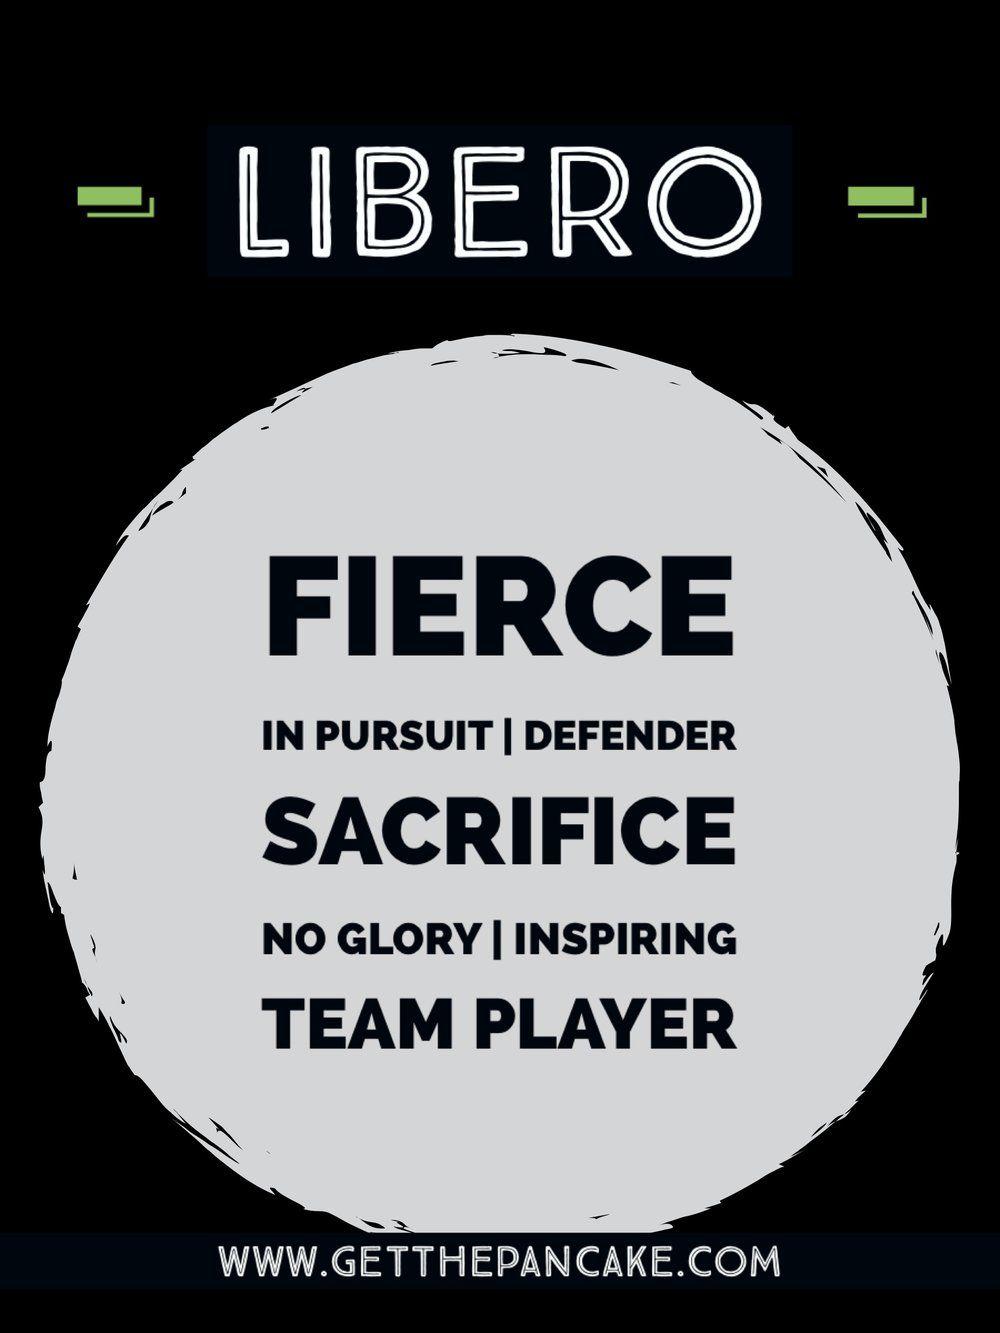 Volleyball Libero Description Volleyball Positions Volleyball Inspiration Volleyball Motivation